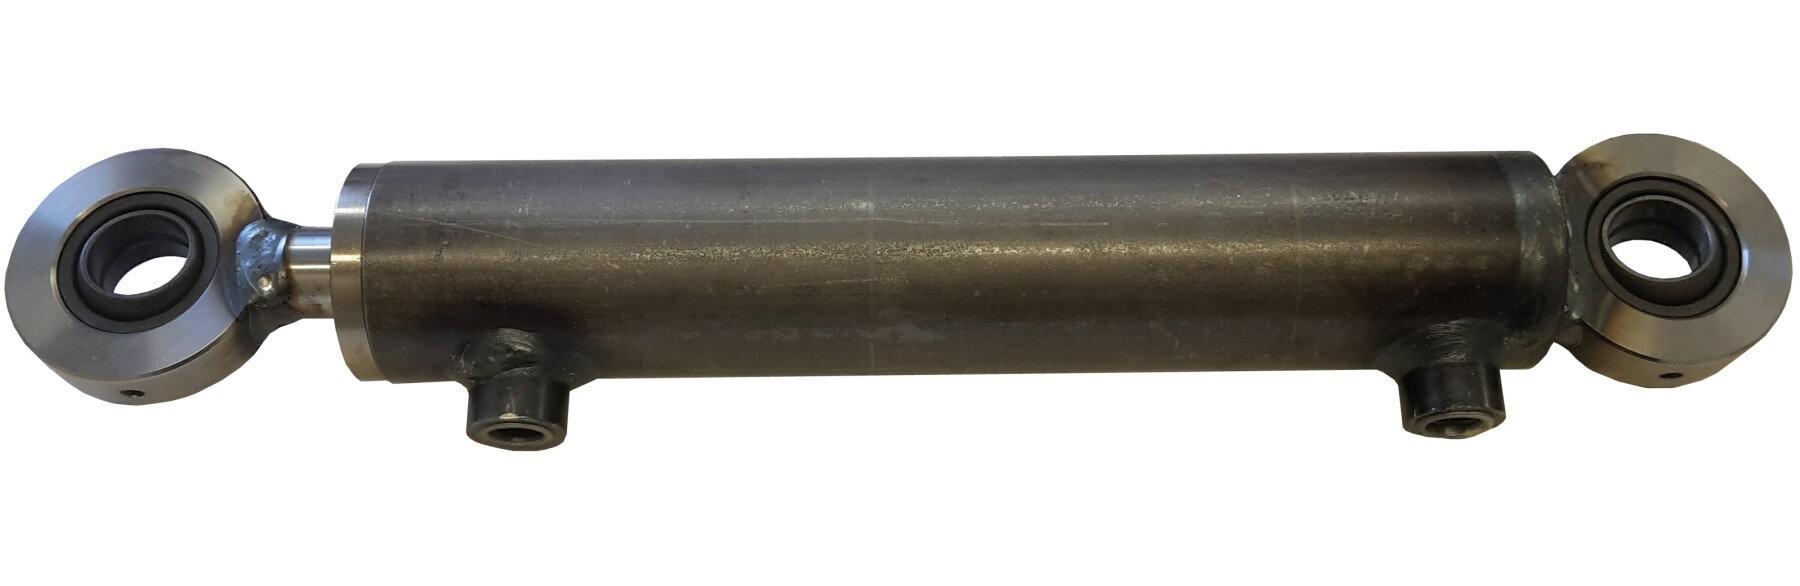 Hydraulisylinteri CL 50. 25. 500 GE